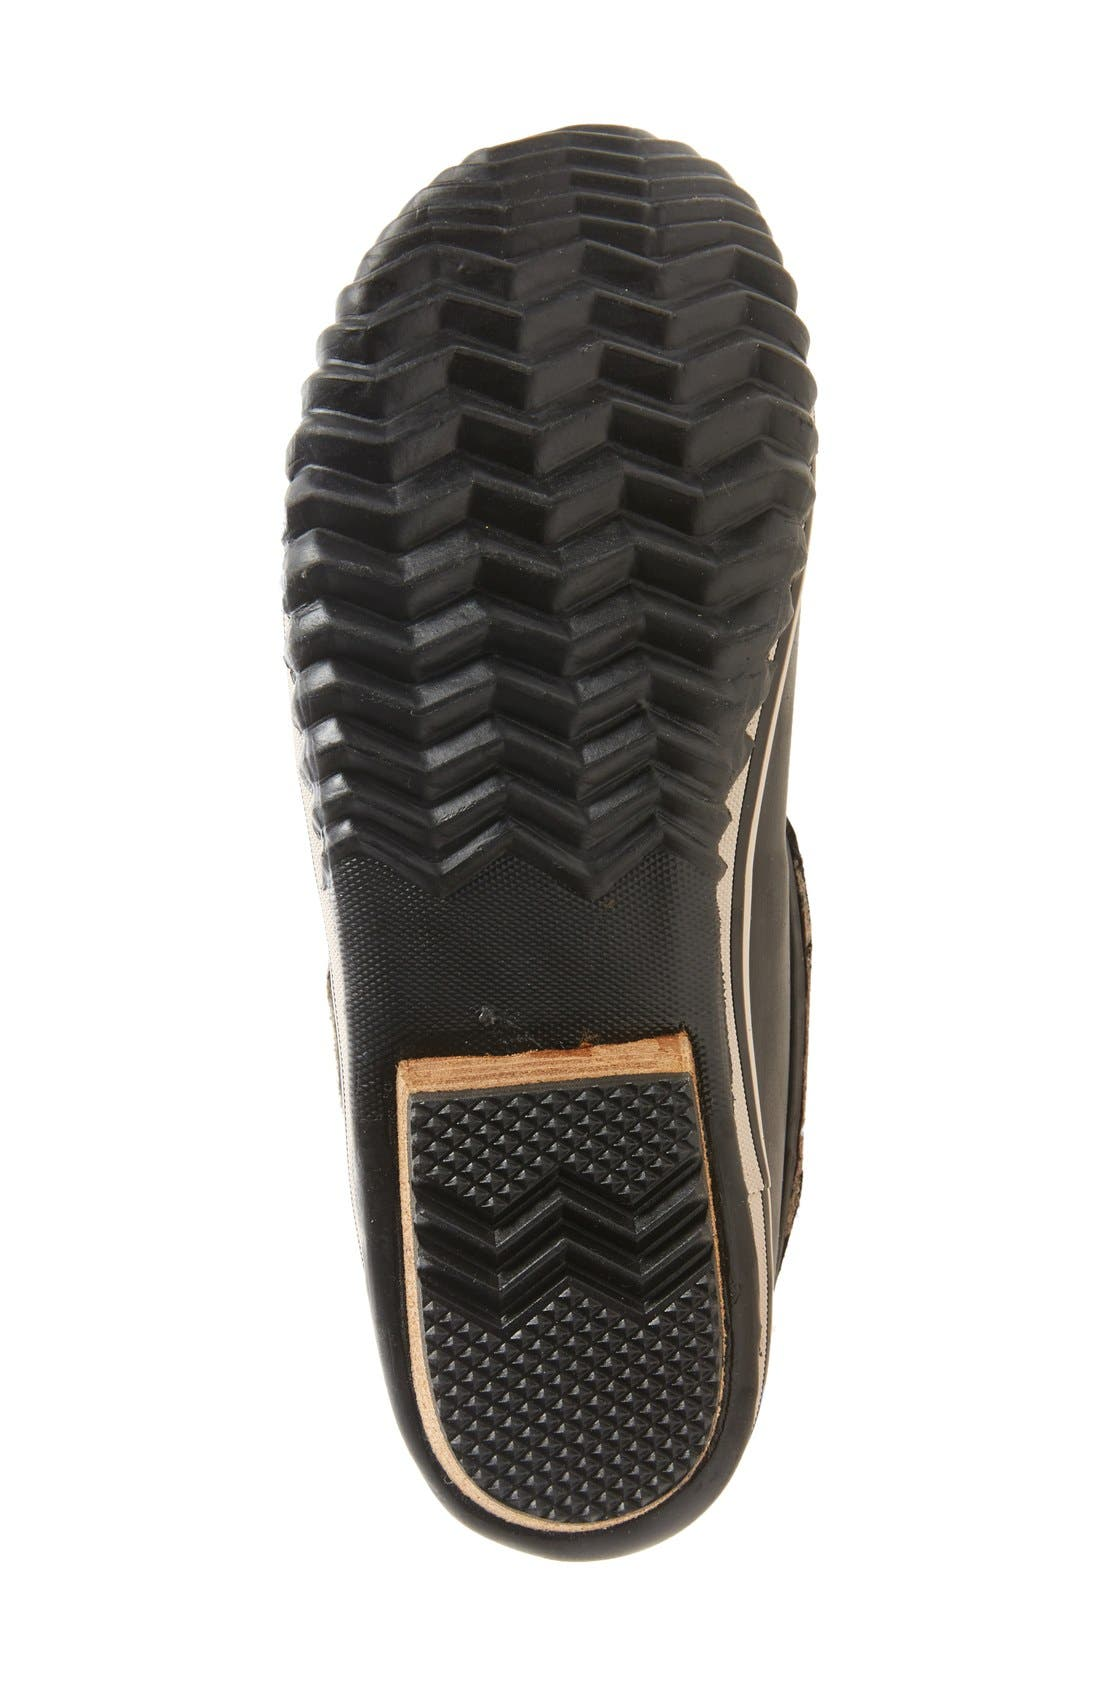 Alternate Image 4  - SOREL 'Conquest Carly II' Waterproof Mid Calf Boot (Women)